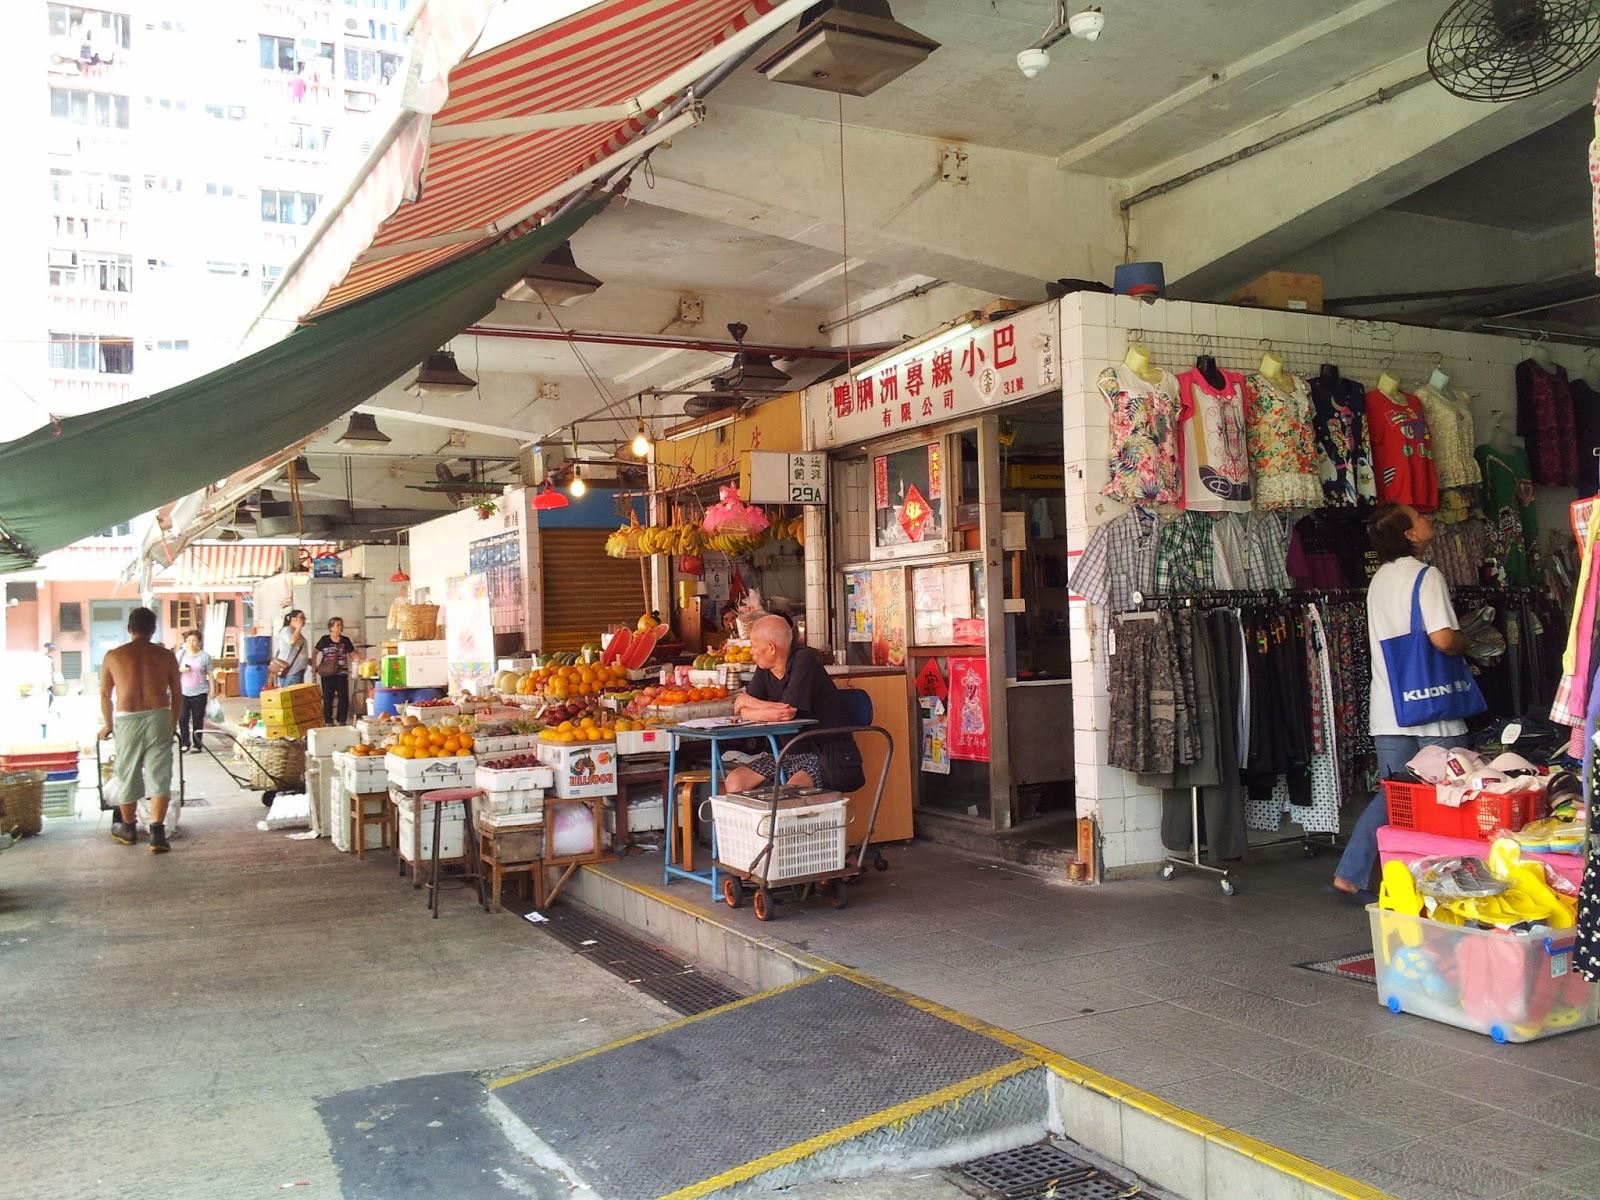 Grassroots O2: [領匯商場] 鴨脷洲邨商舖 @2014-09-06